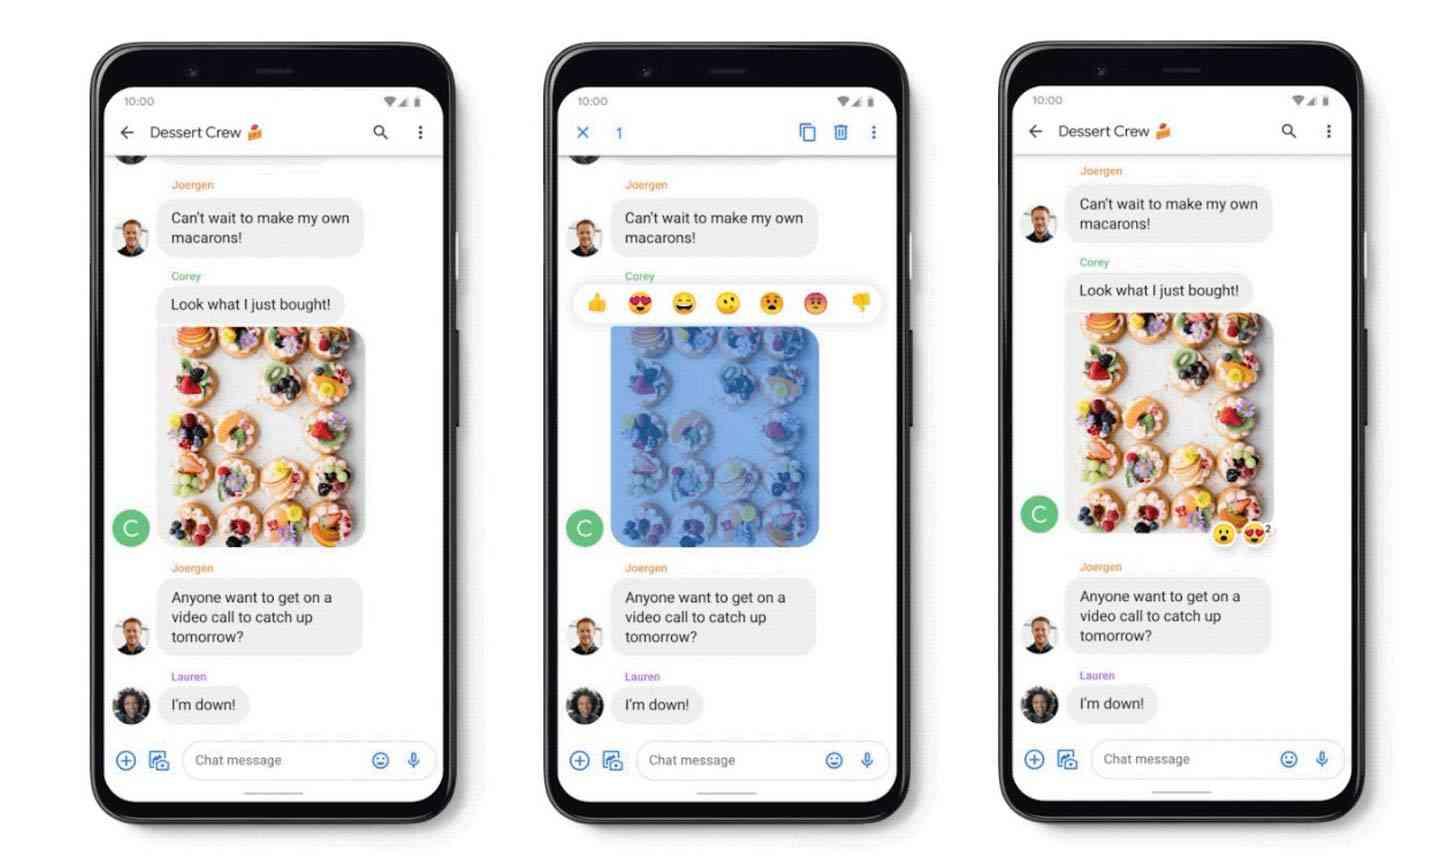 Google Messages iMessage reactions